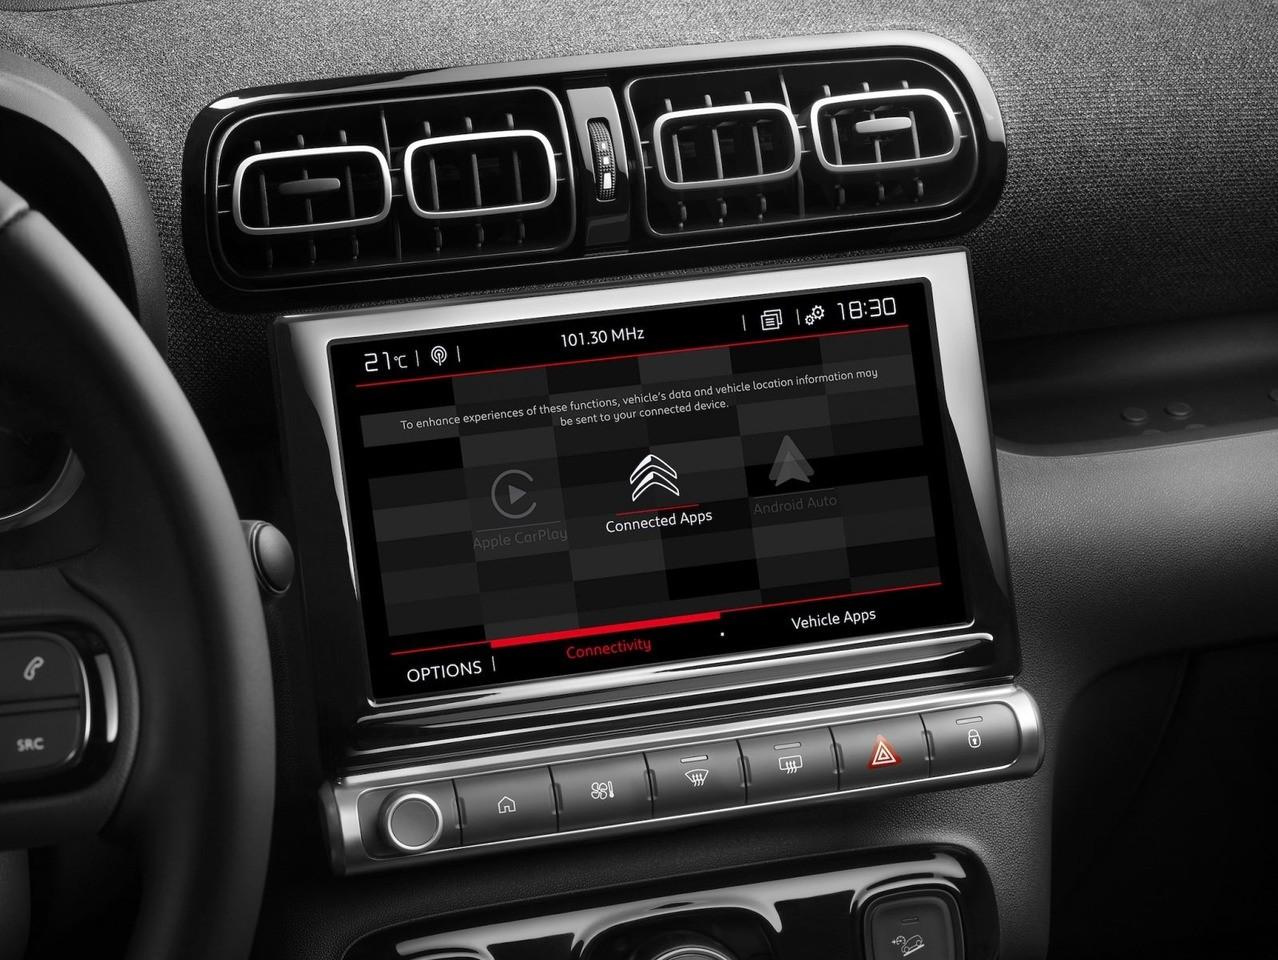 Foto Citroën C3 Aircross 2021 - interior